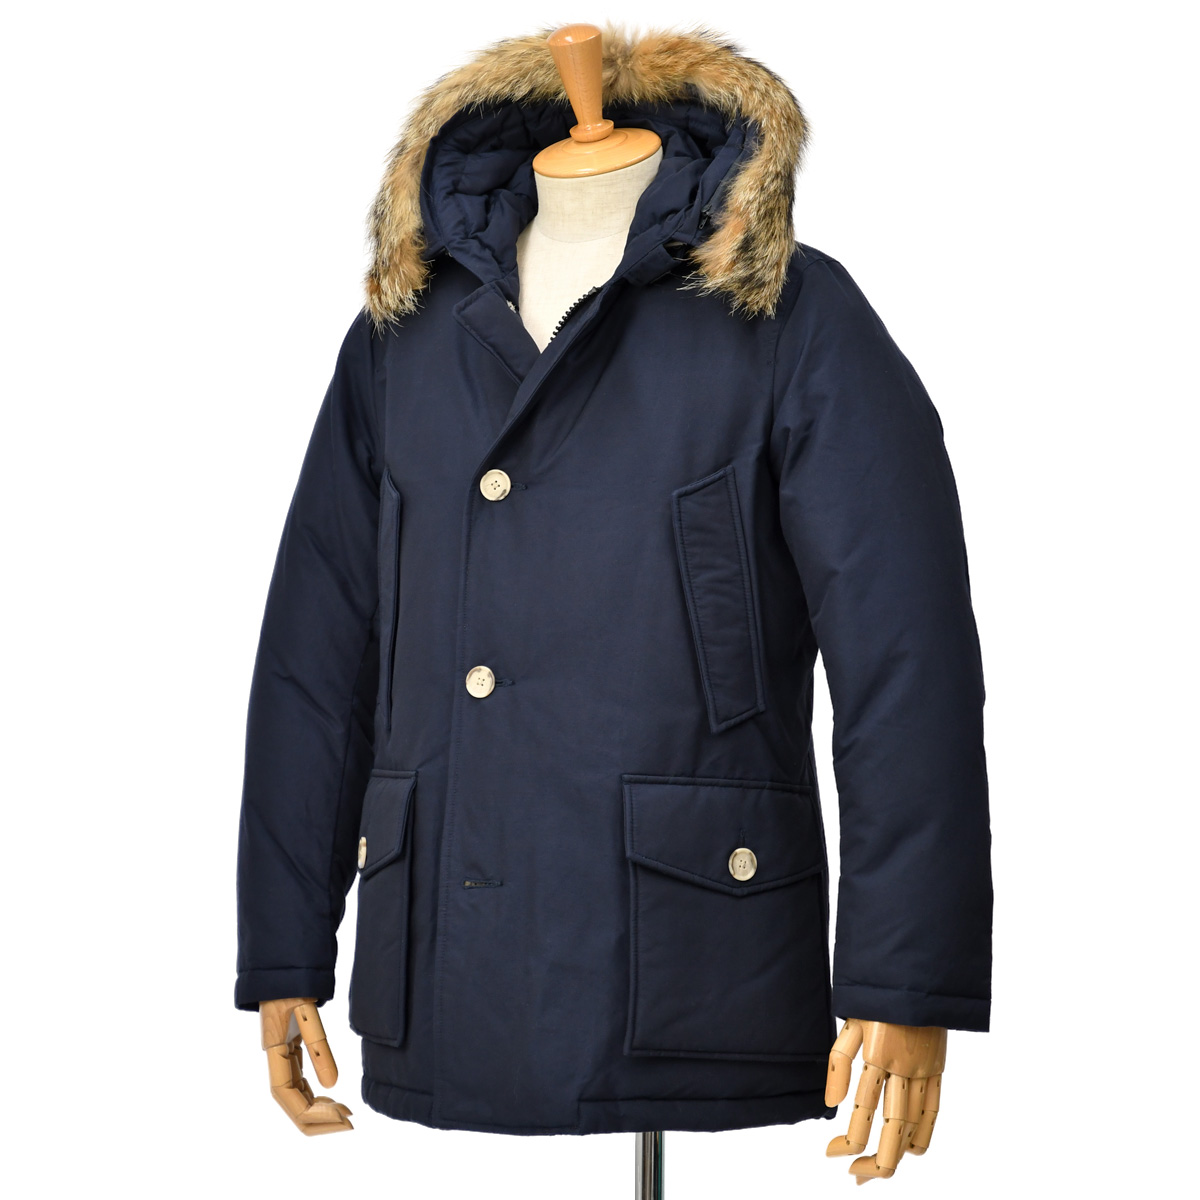 【30%OFF】【size M】WOOLRICH【ウールリッチ】ダウンジャケット ARCTIC PARKA WOCPS2919 MELTON BLUE ネイビー